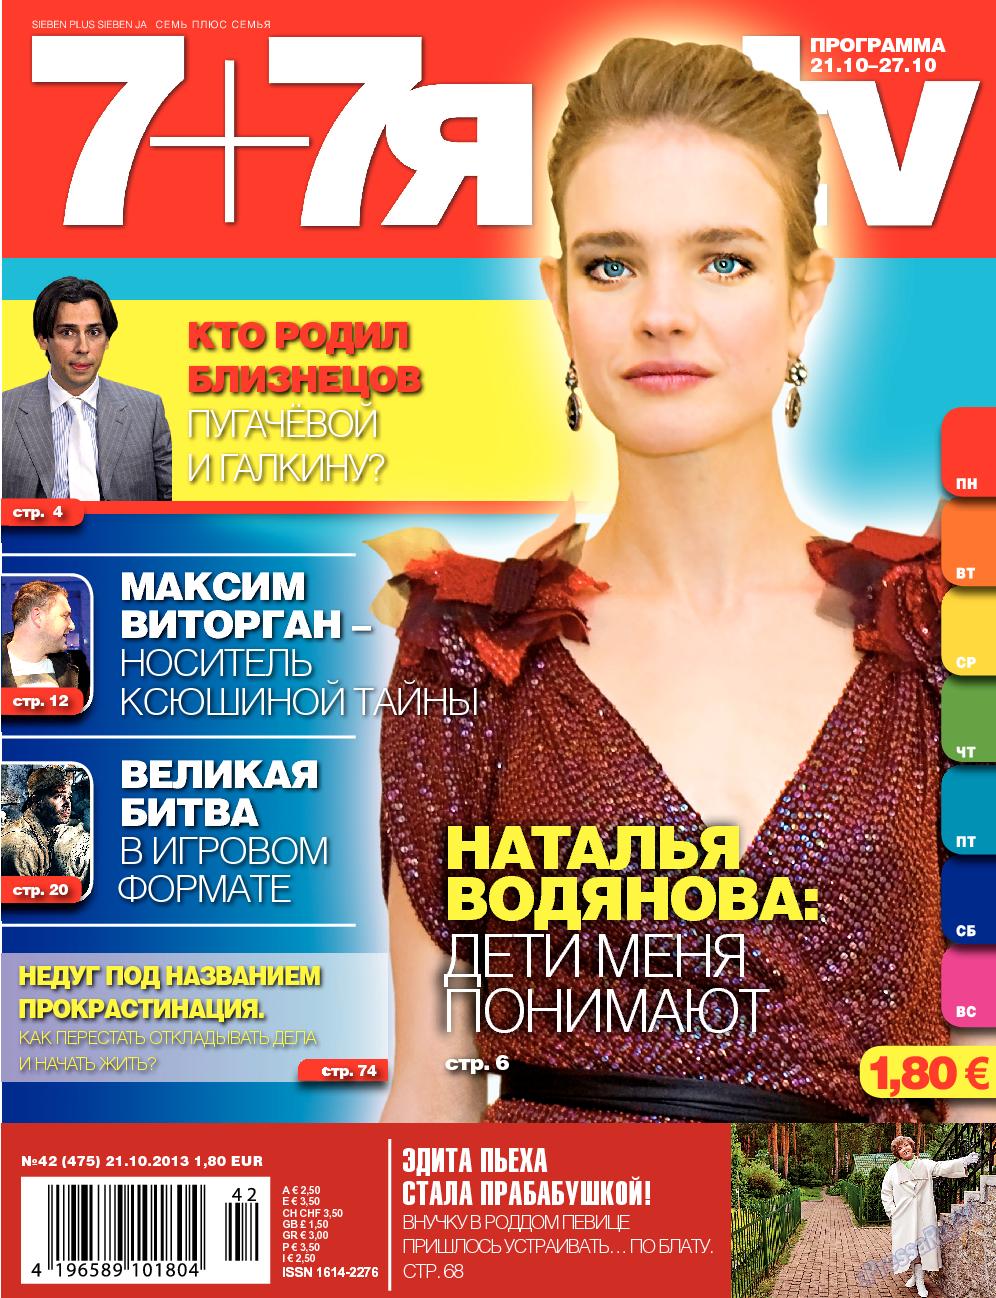 7плюс7я (журнал). 2013 год, номер 42, стр. 1